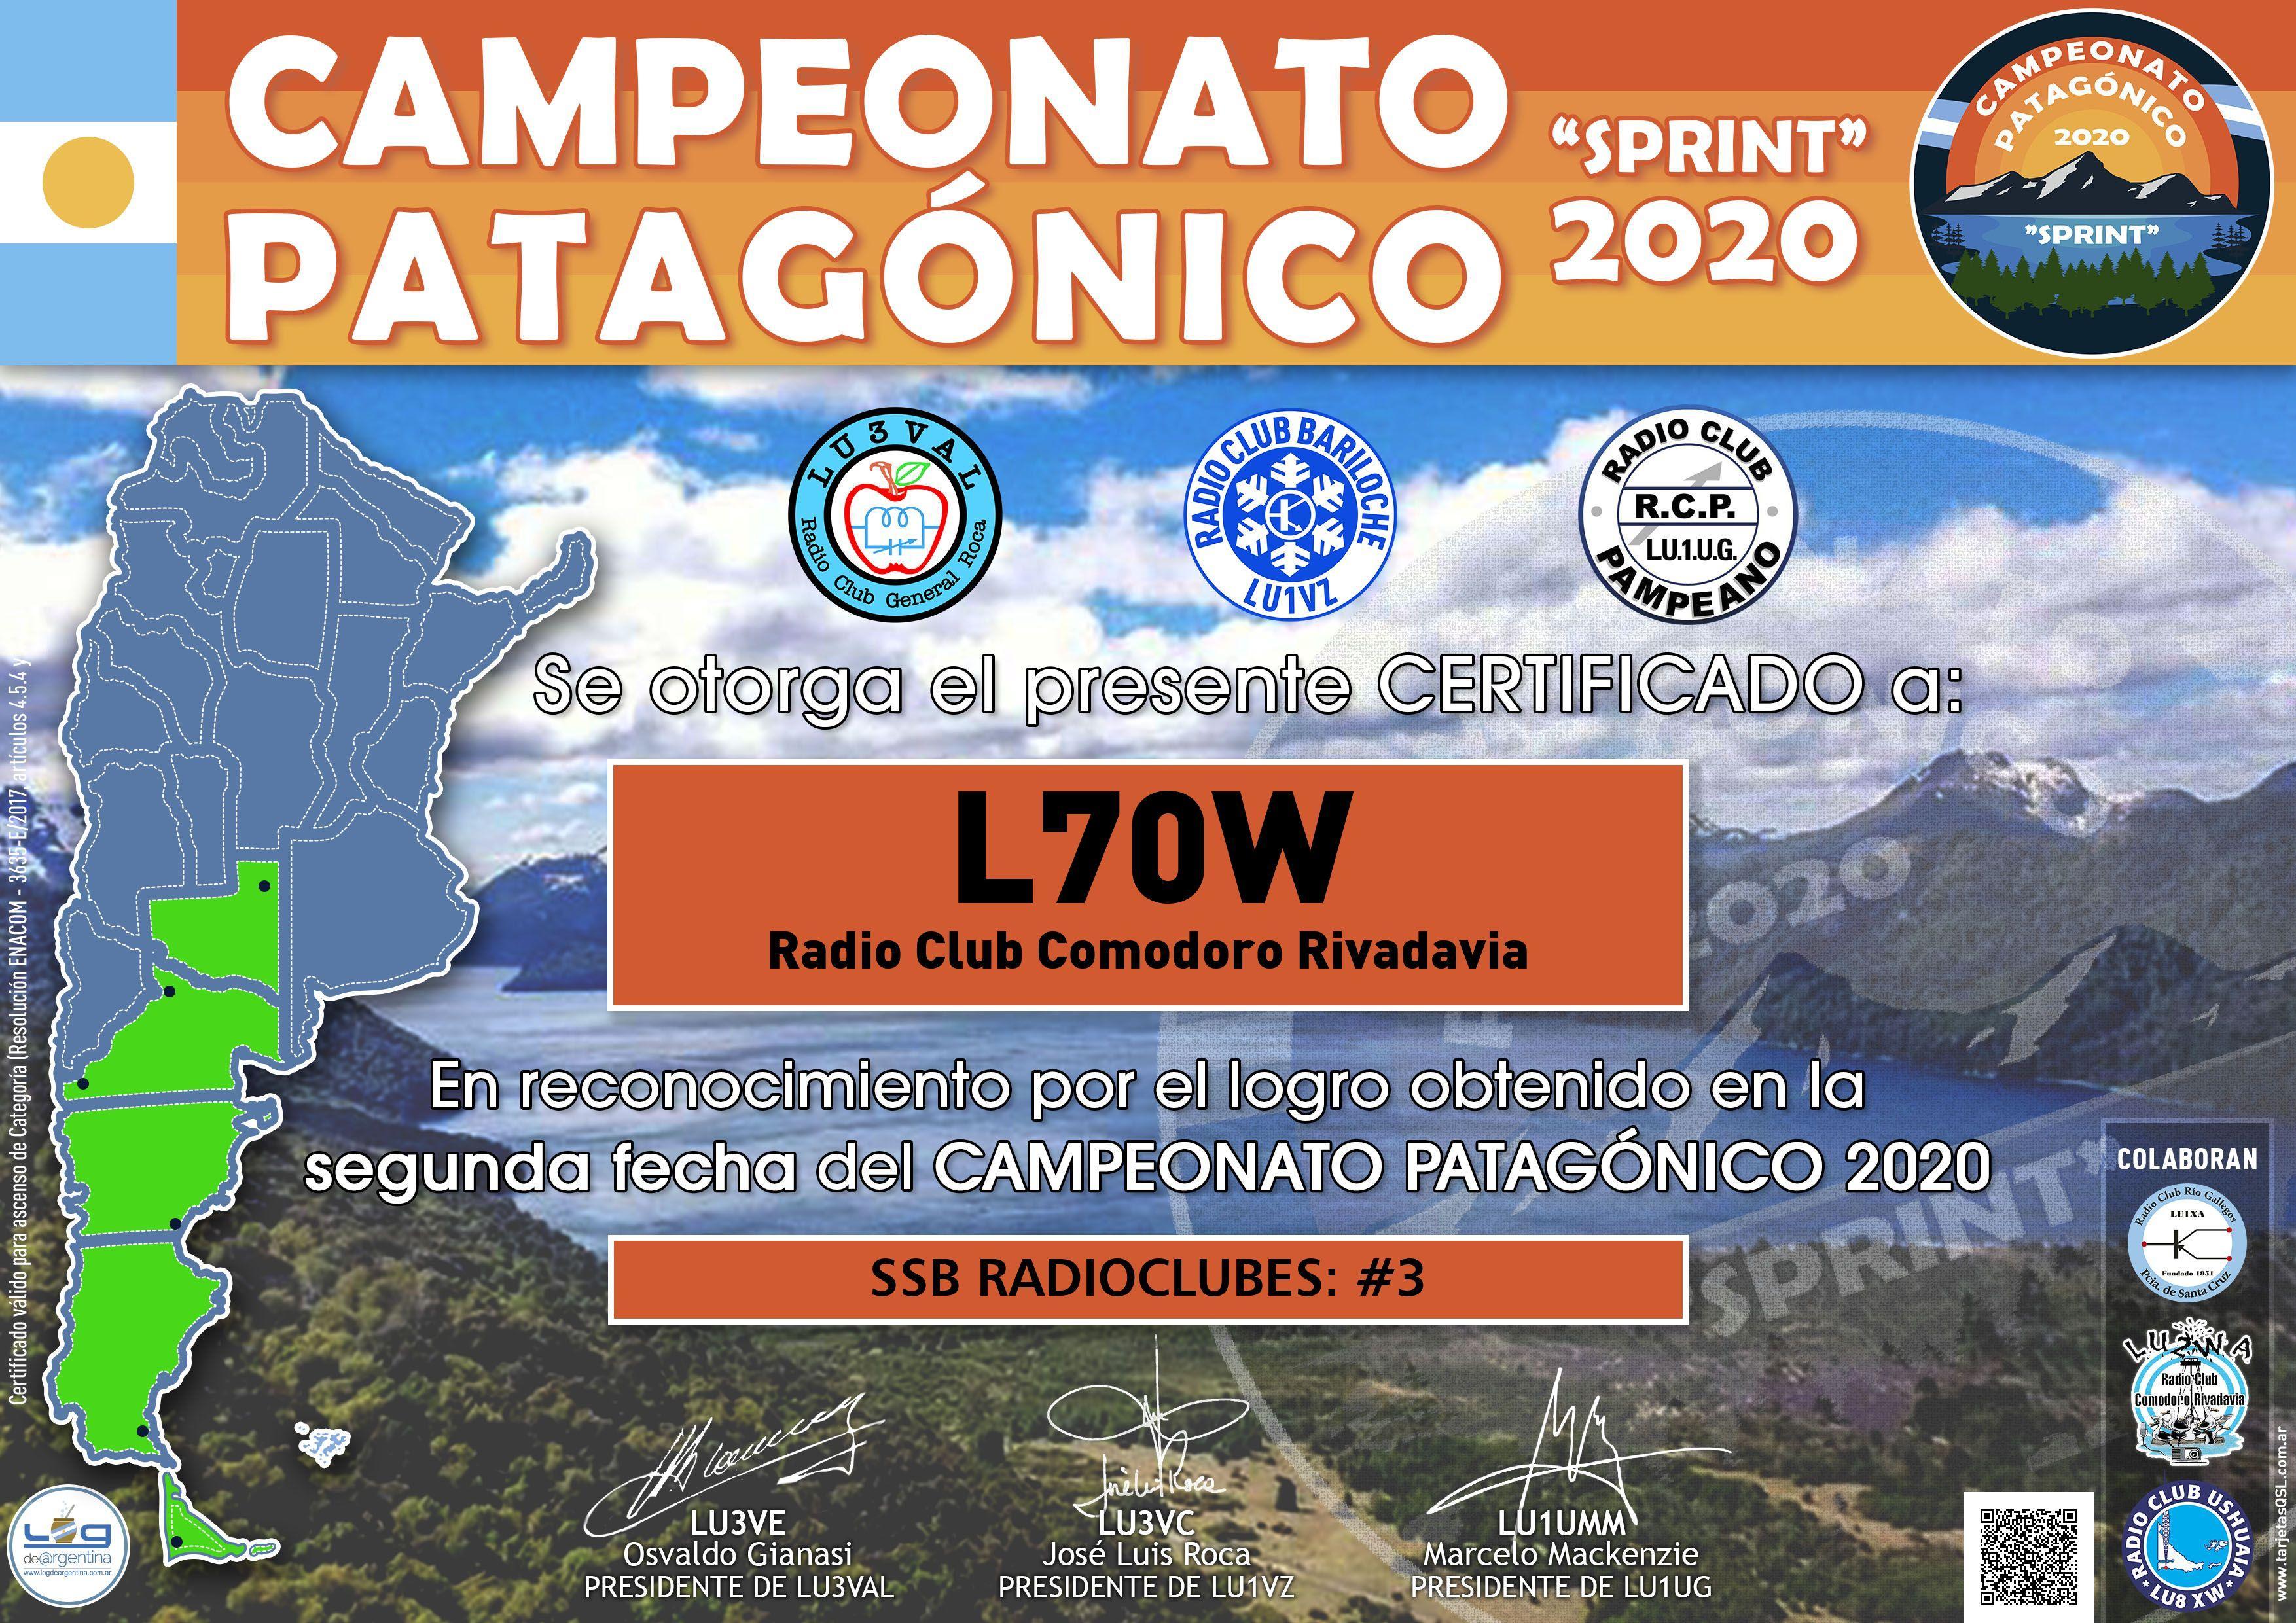 2020 12 12 lu2wa l70w Sprint patagonico 2dafecha ssb - Resultados 2da. fecha Campeonato Patagónico 2020